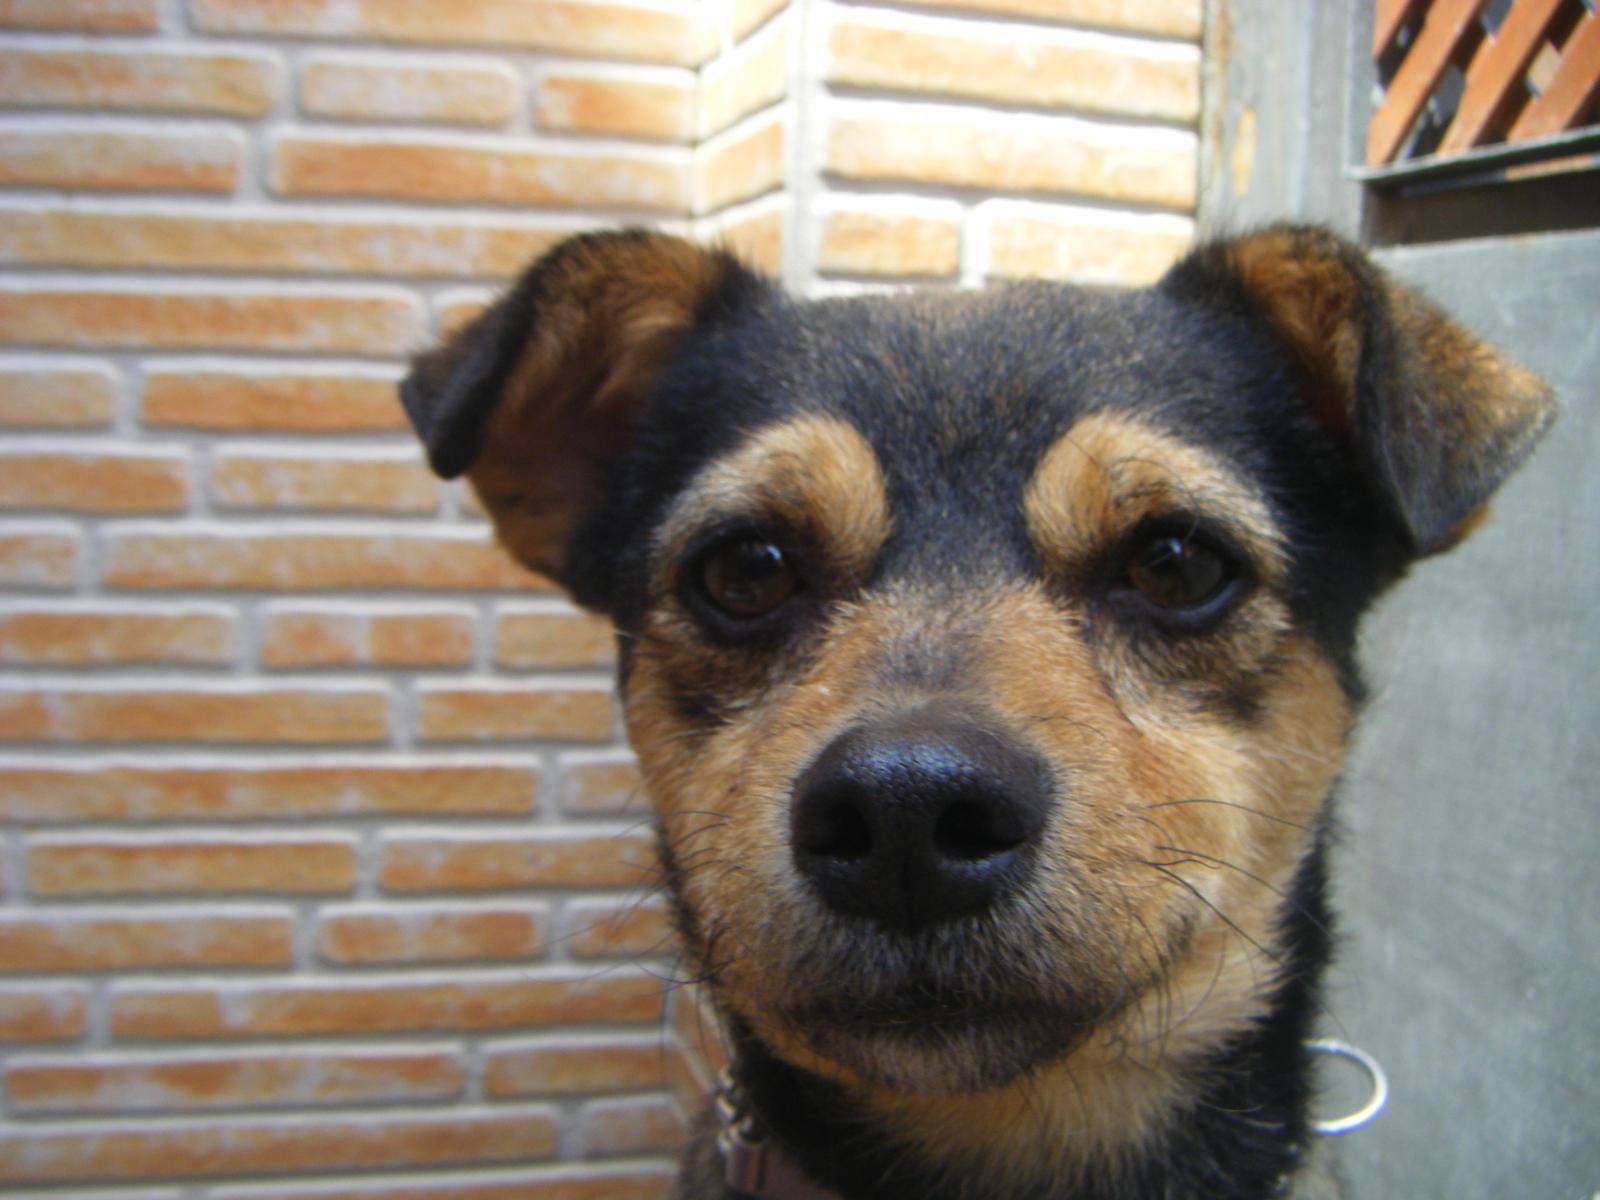 Caseta de perro for Caseta perro pequeno